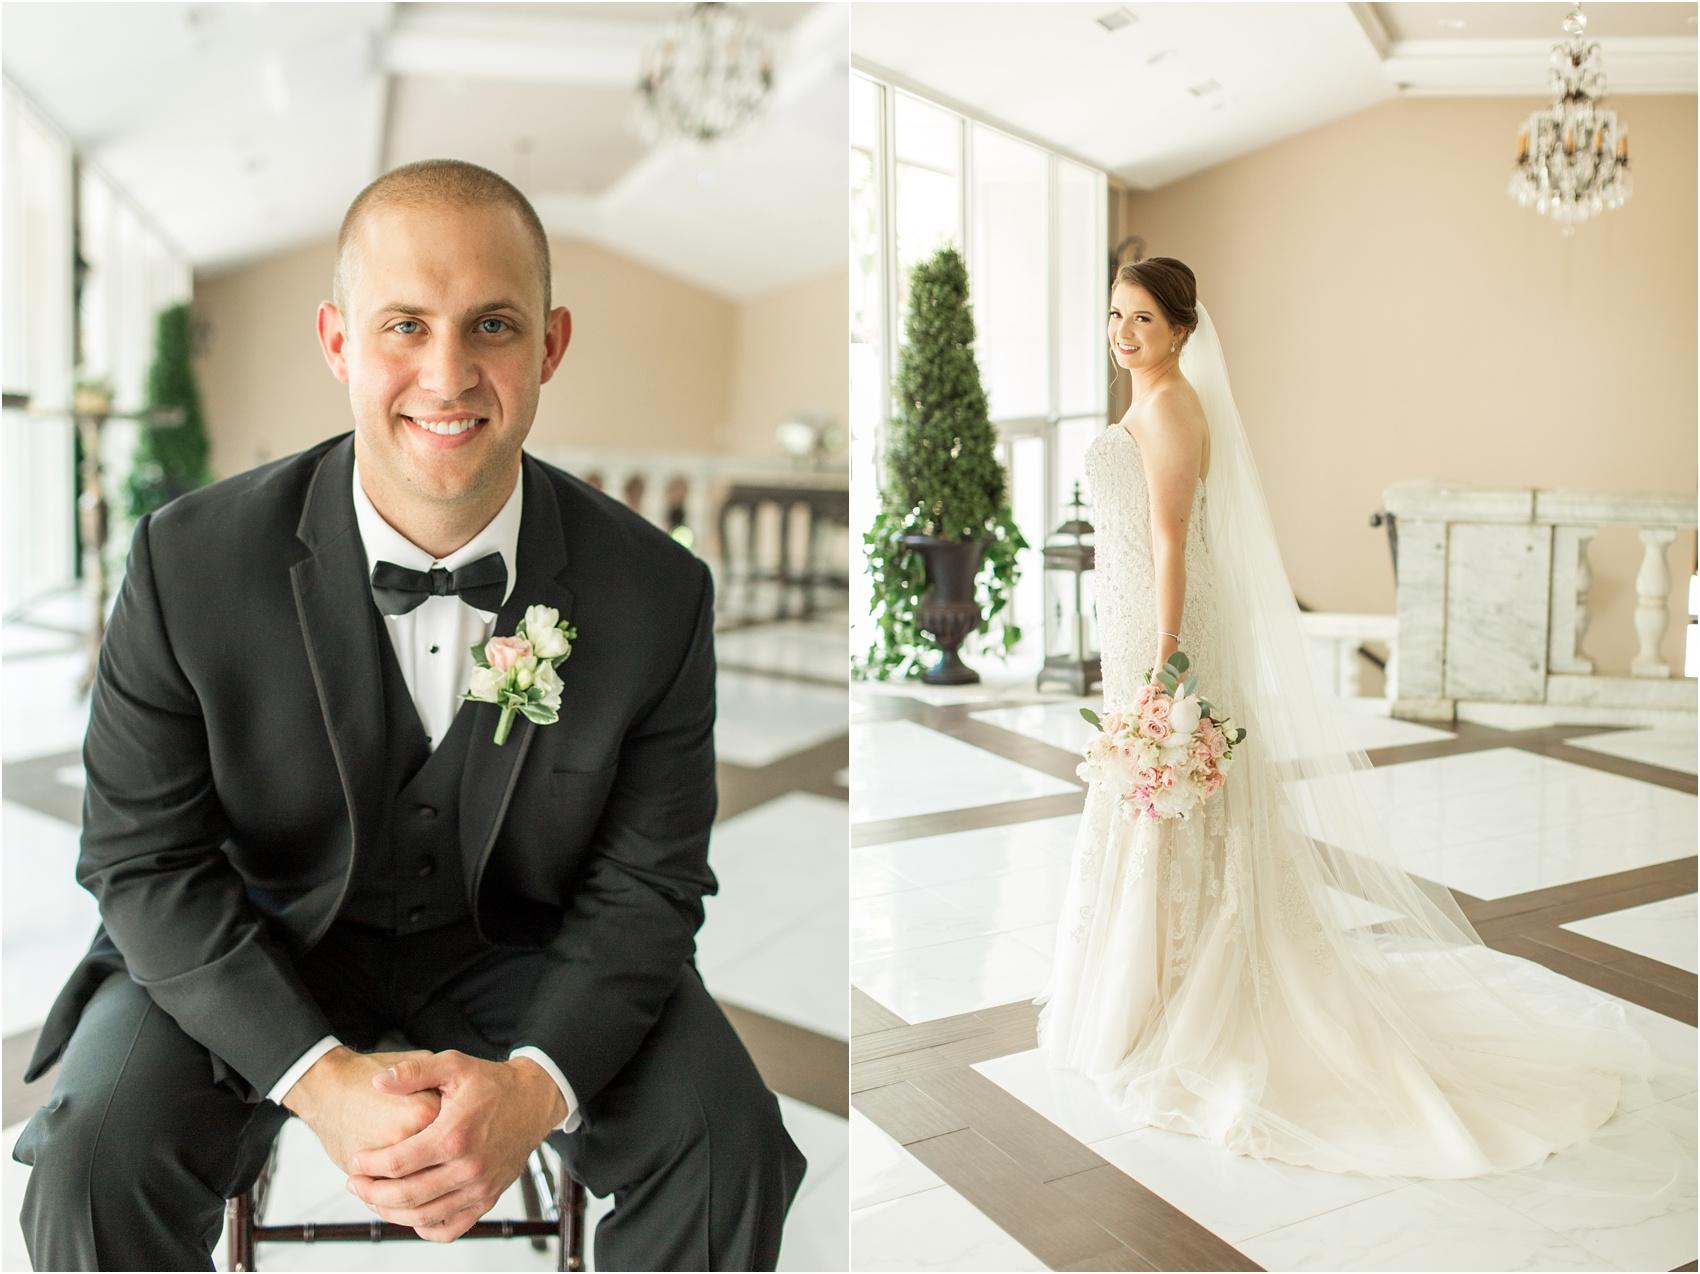 Savannah Eve Photography- Nutt Wedding- Blog-38.jpg